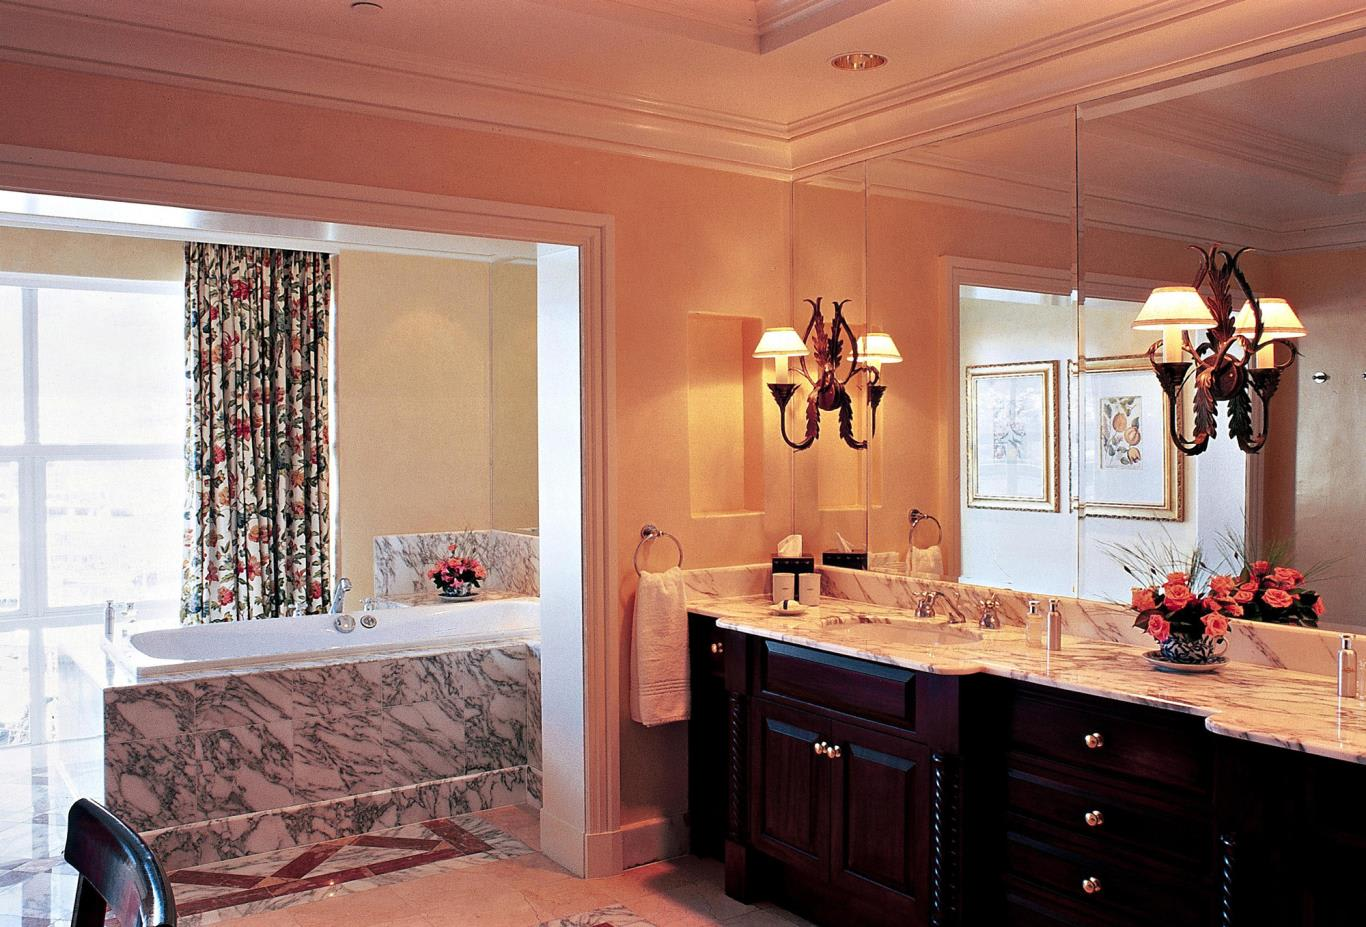 Table-Mountain-Suite-Bathroom